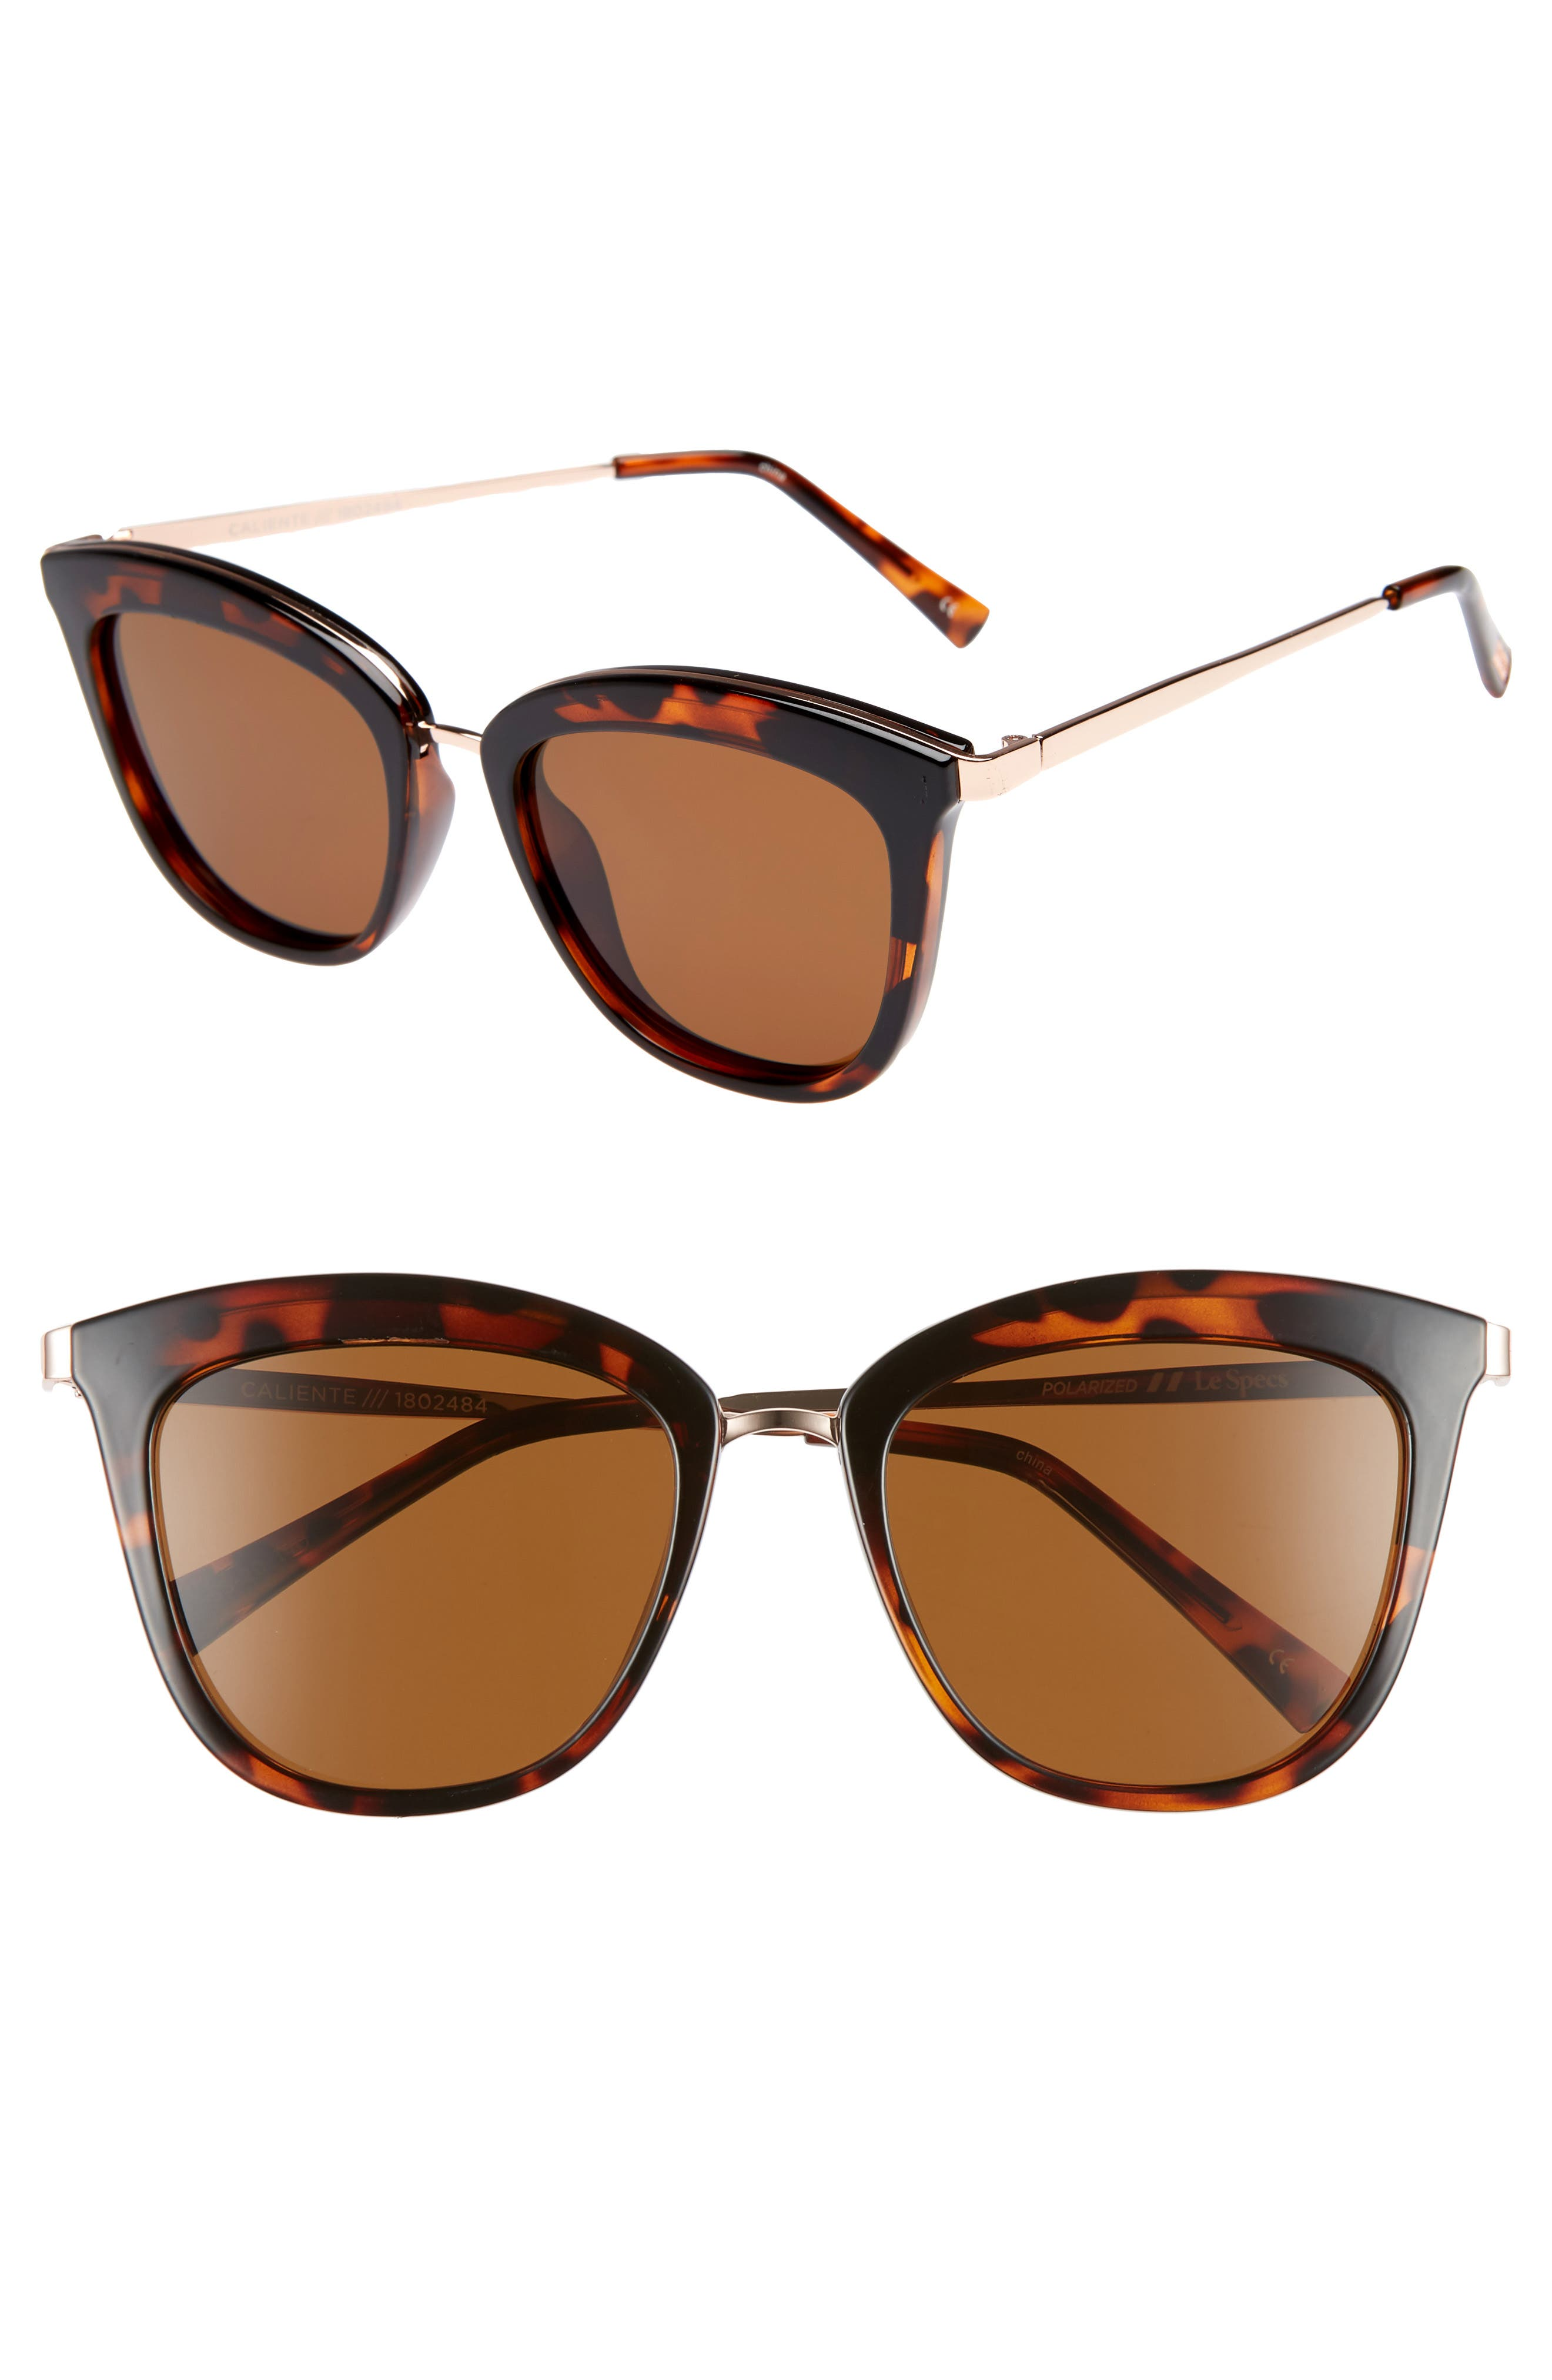 Caliente 53mm Polarized Cat Eye Sunglasses,                             Main thumbnail 1, color,                             TORTOISE / ROSE GOLD